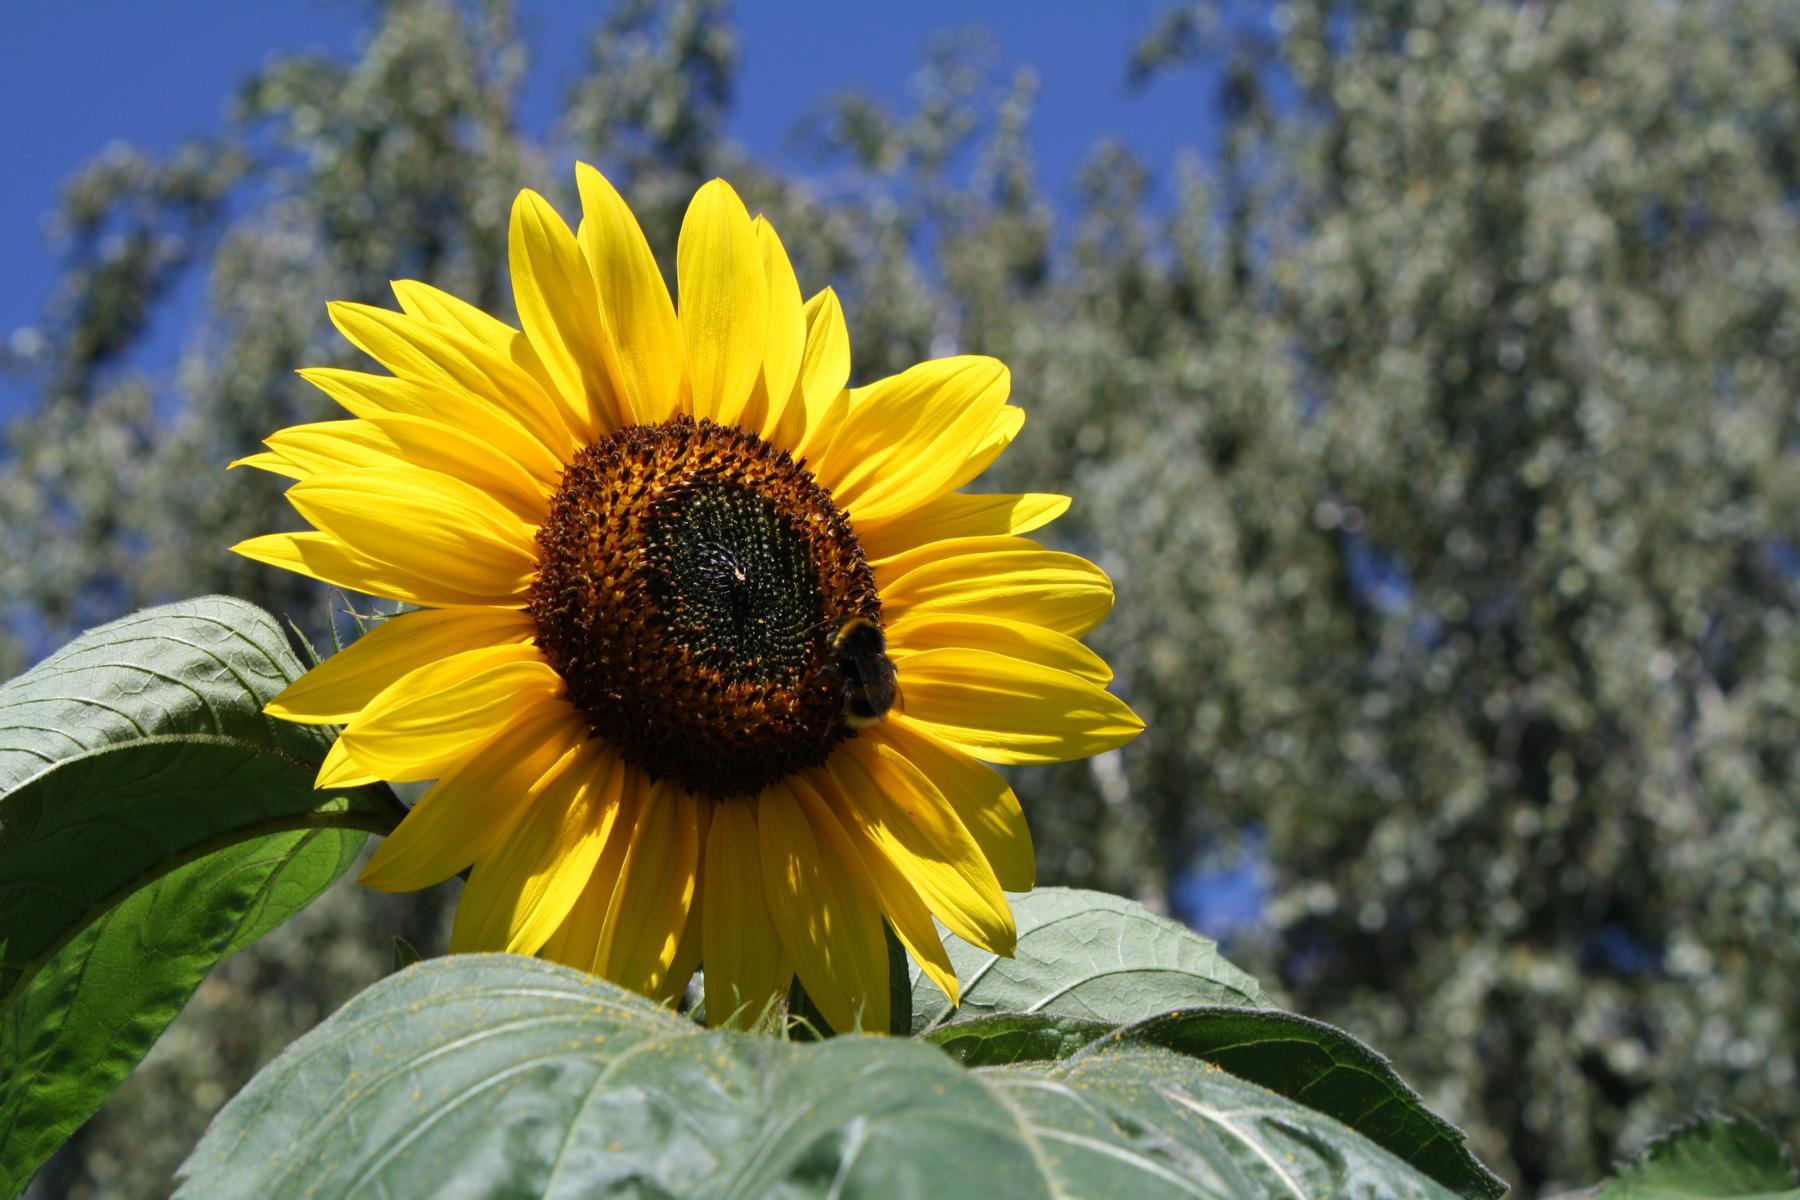 Honigwabe Wabe Flecke Saaten Handel Honig Bienen Bienenvolk Bienenstock Hummel